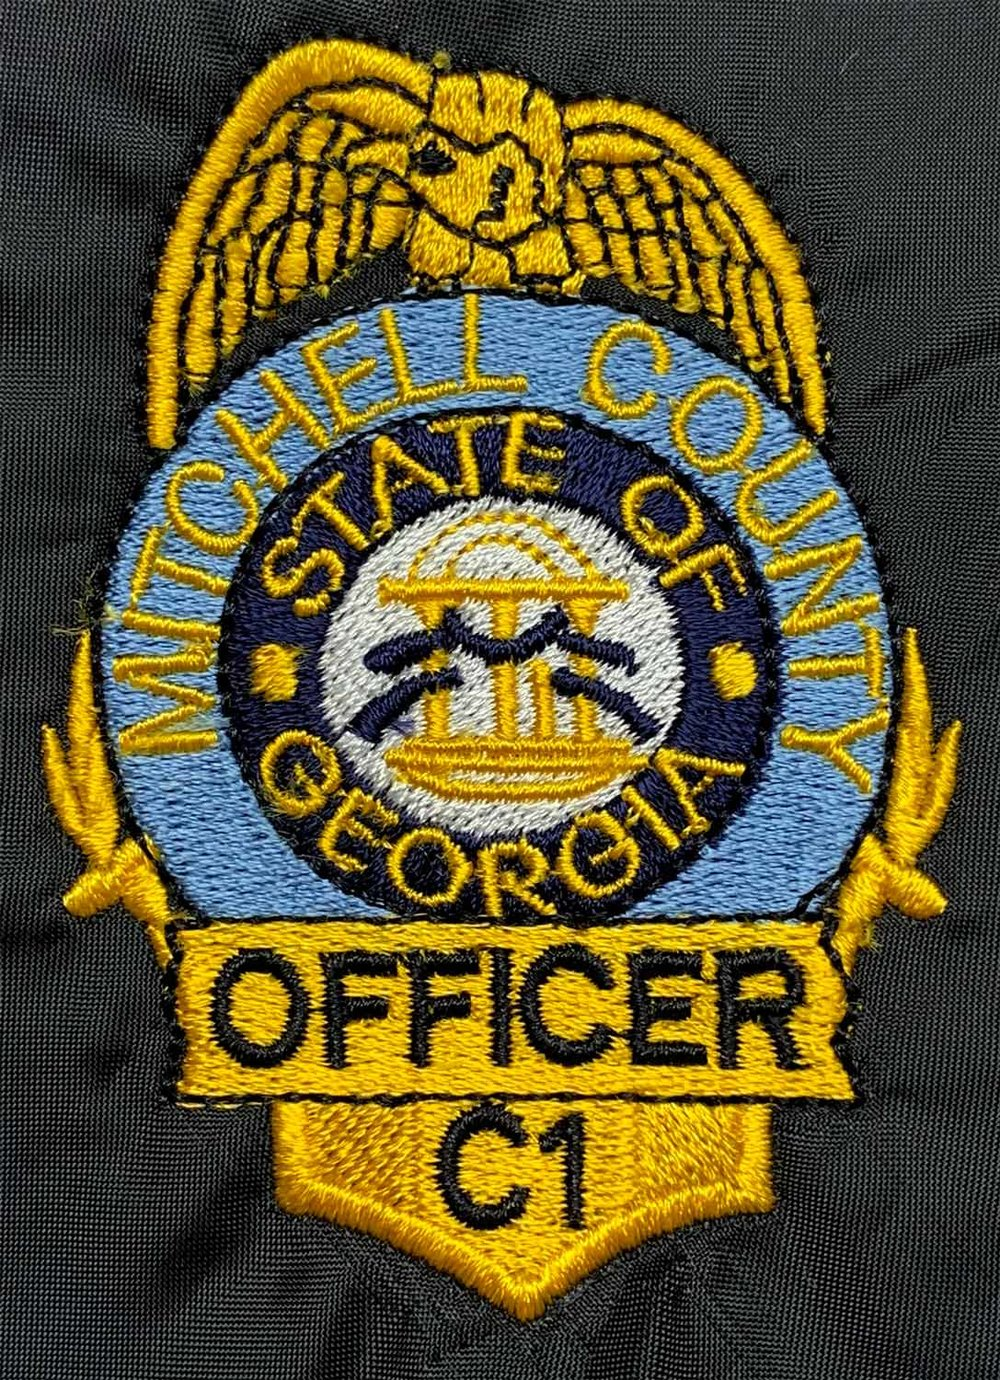 KYC_MITCHELL-COUNTY-OFFICE-STATE-OF-GA_web.jpg